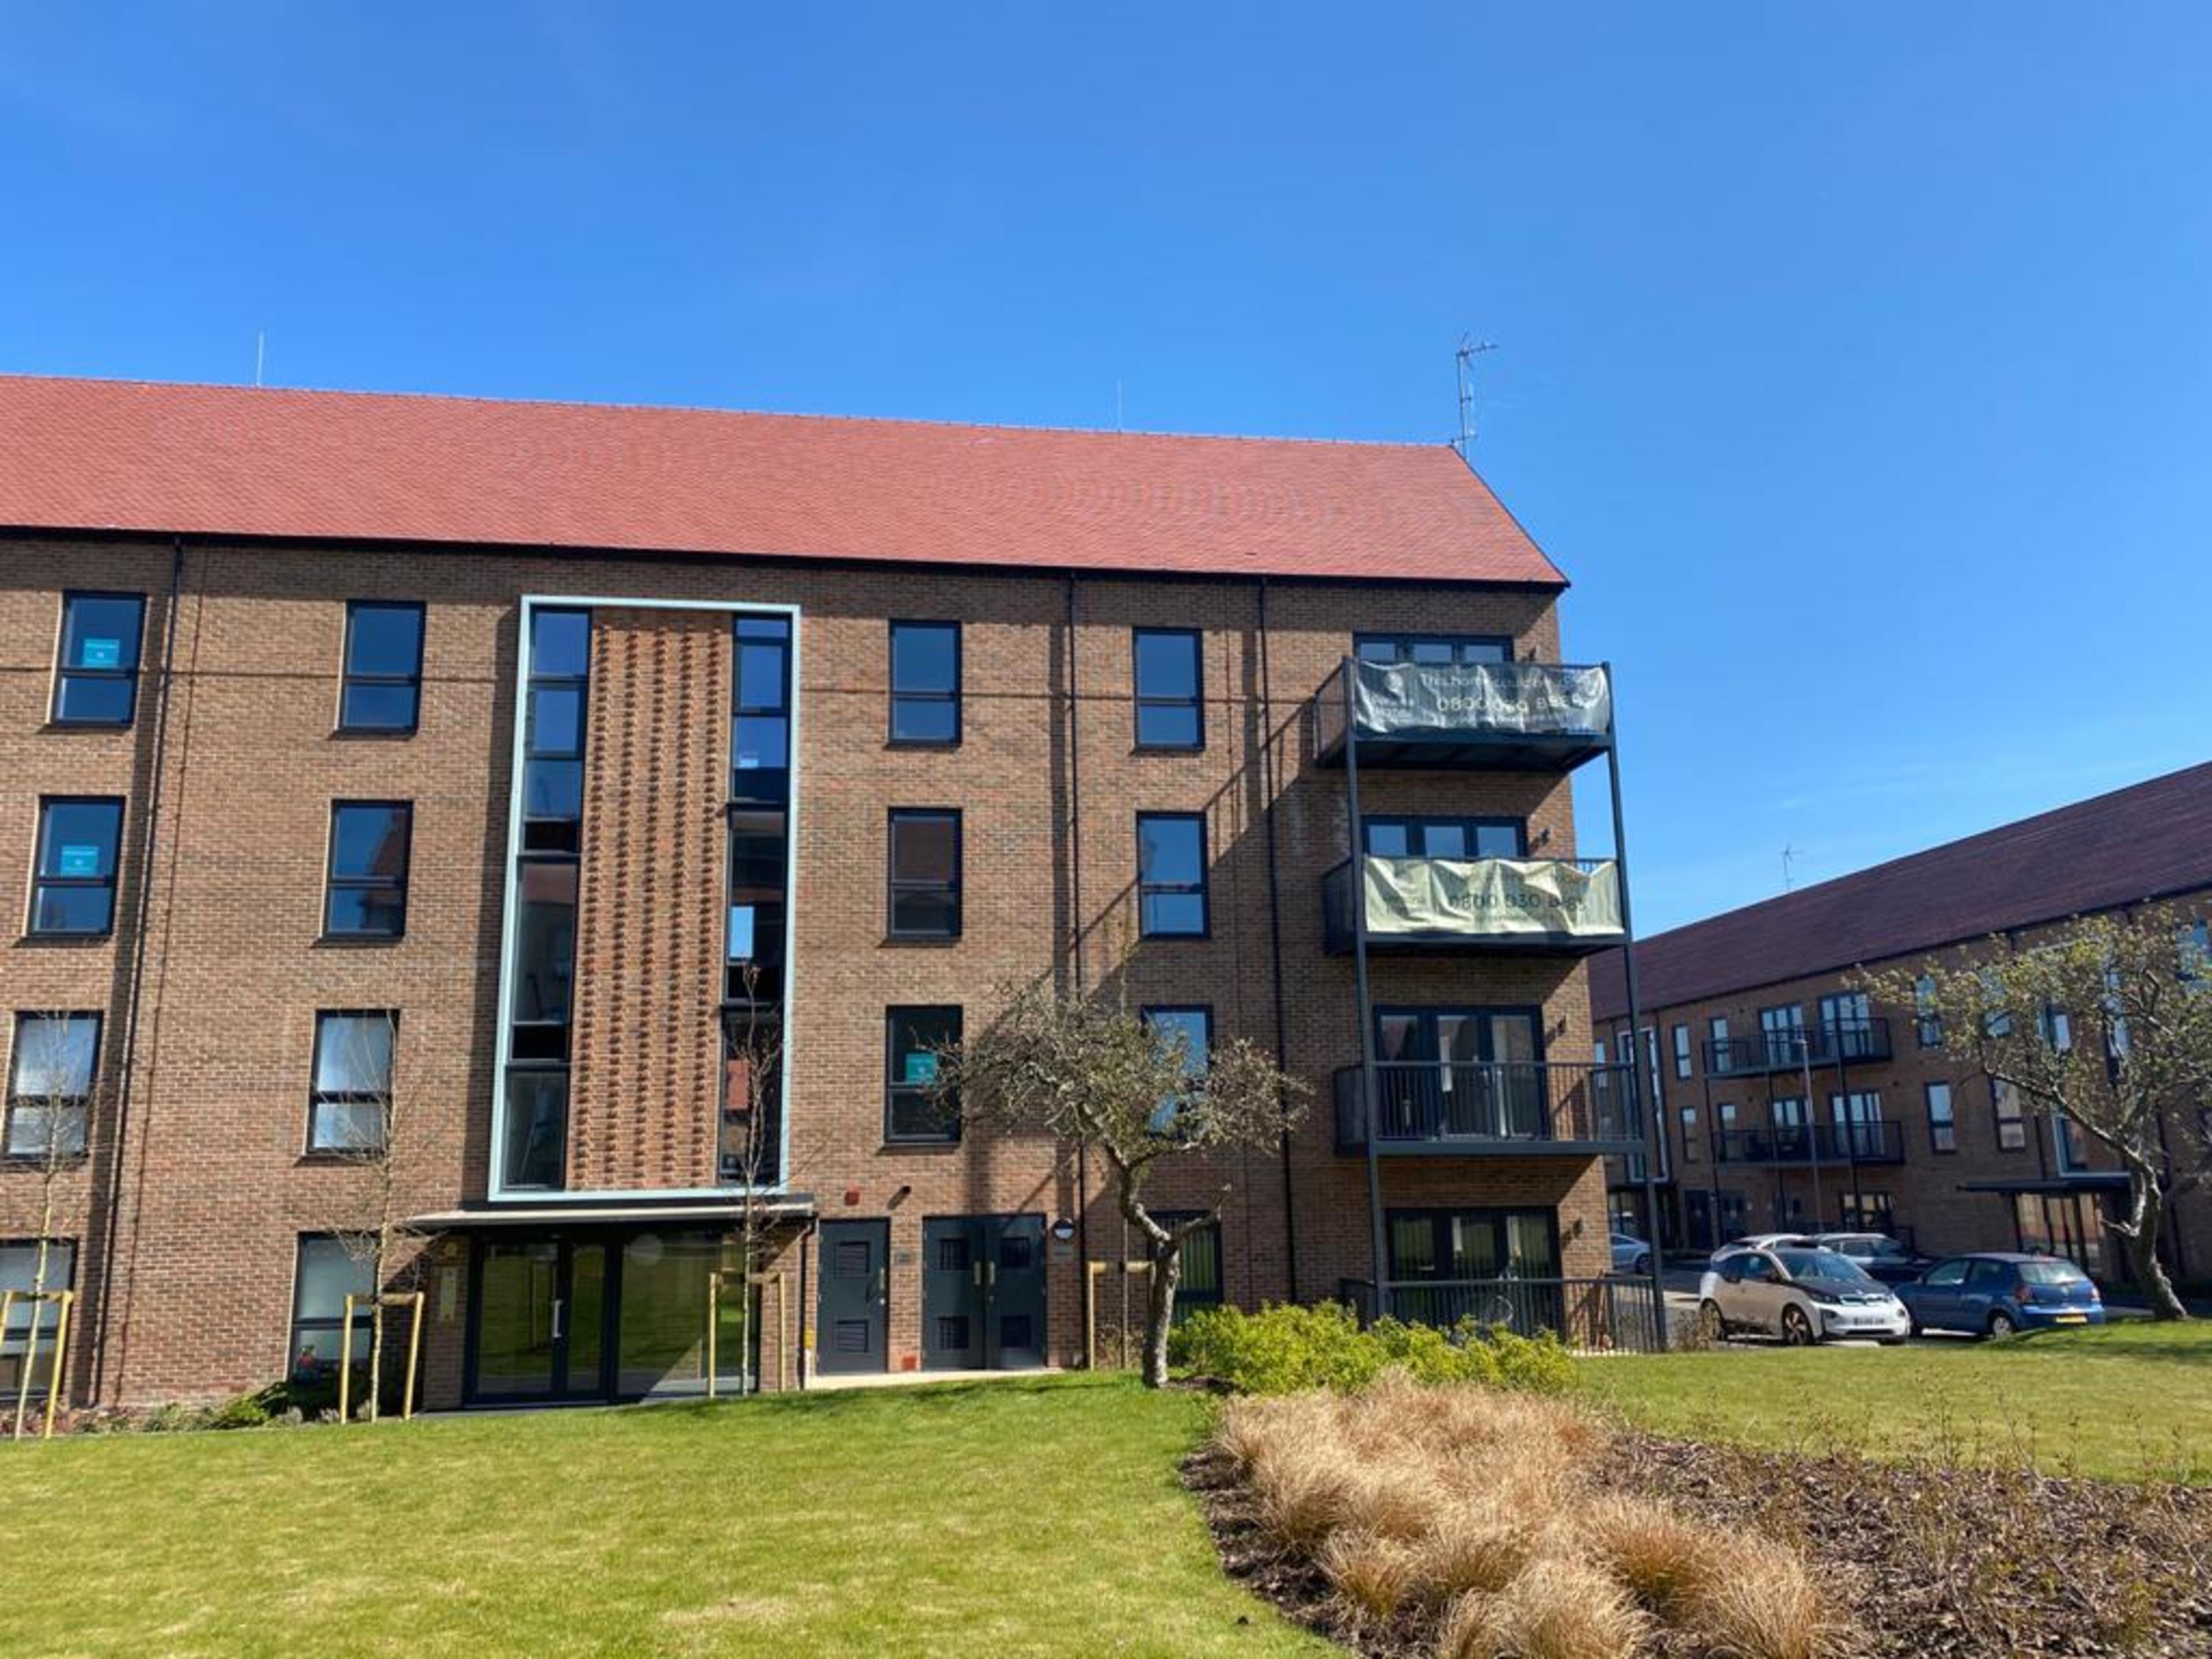 st-georges-park-new-build-2-bed-external-4